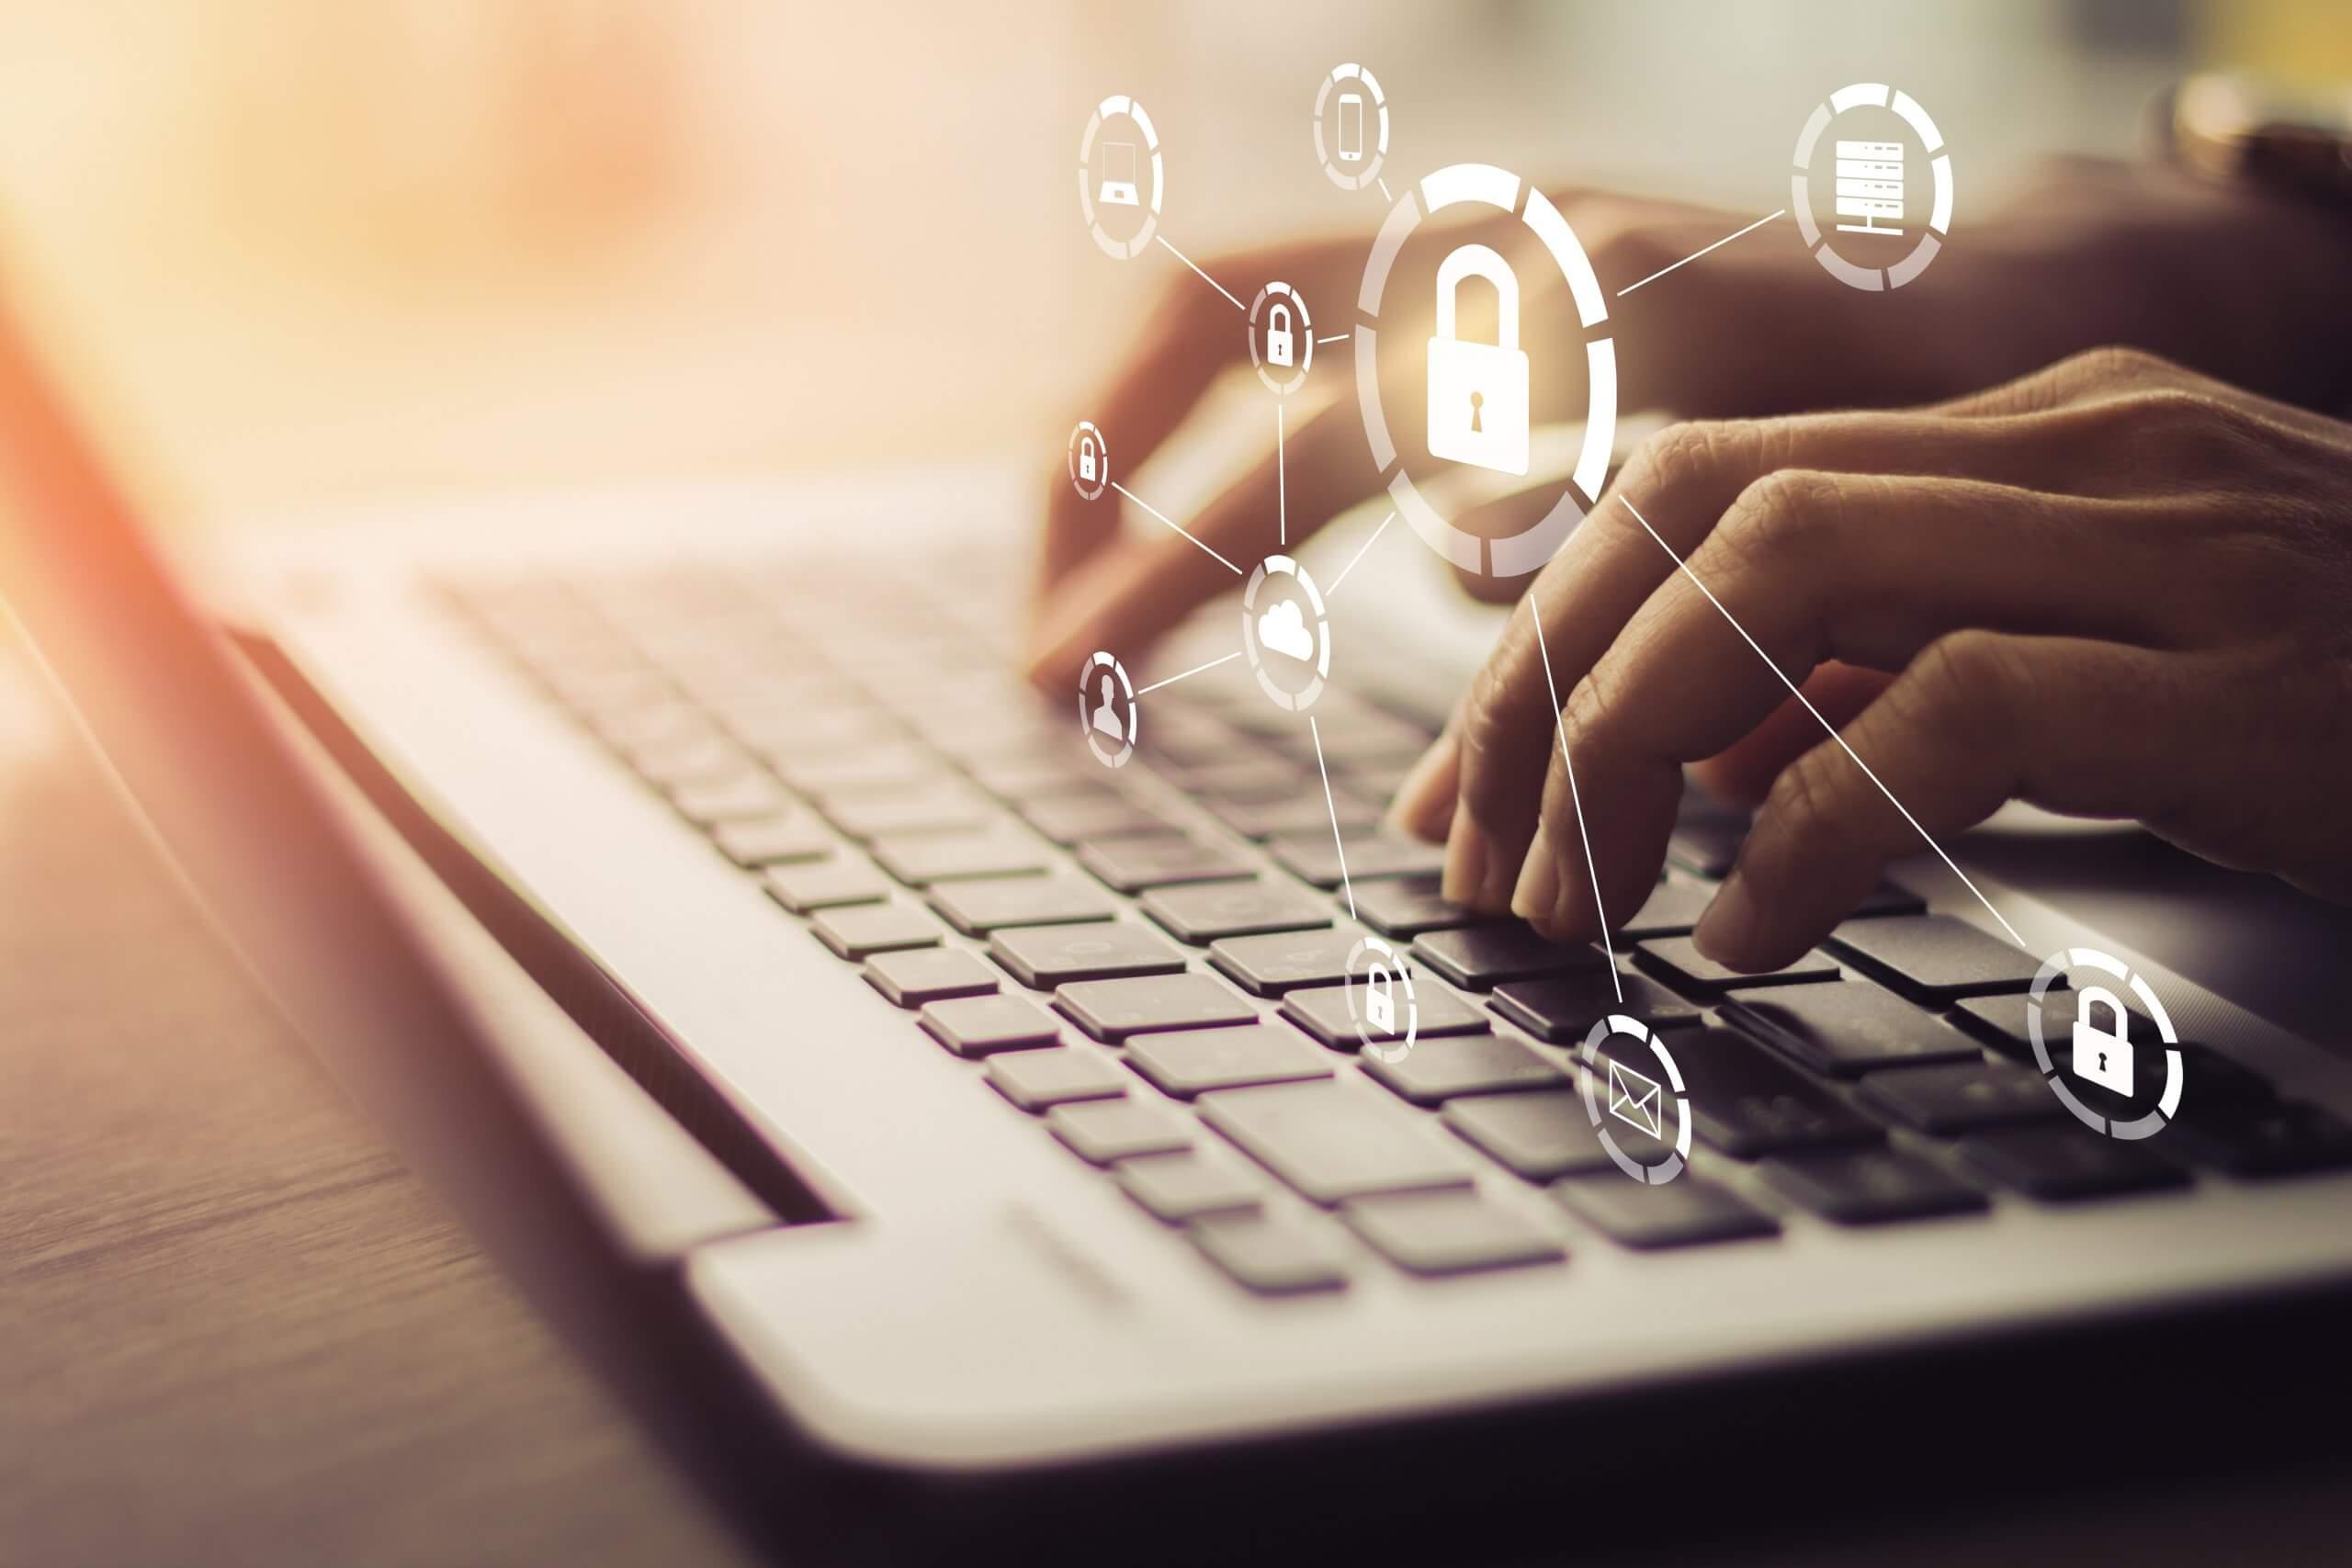 ultime novità sicurezza informatica